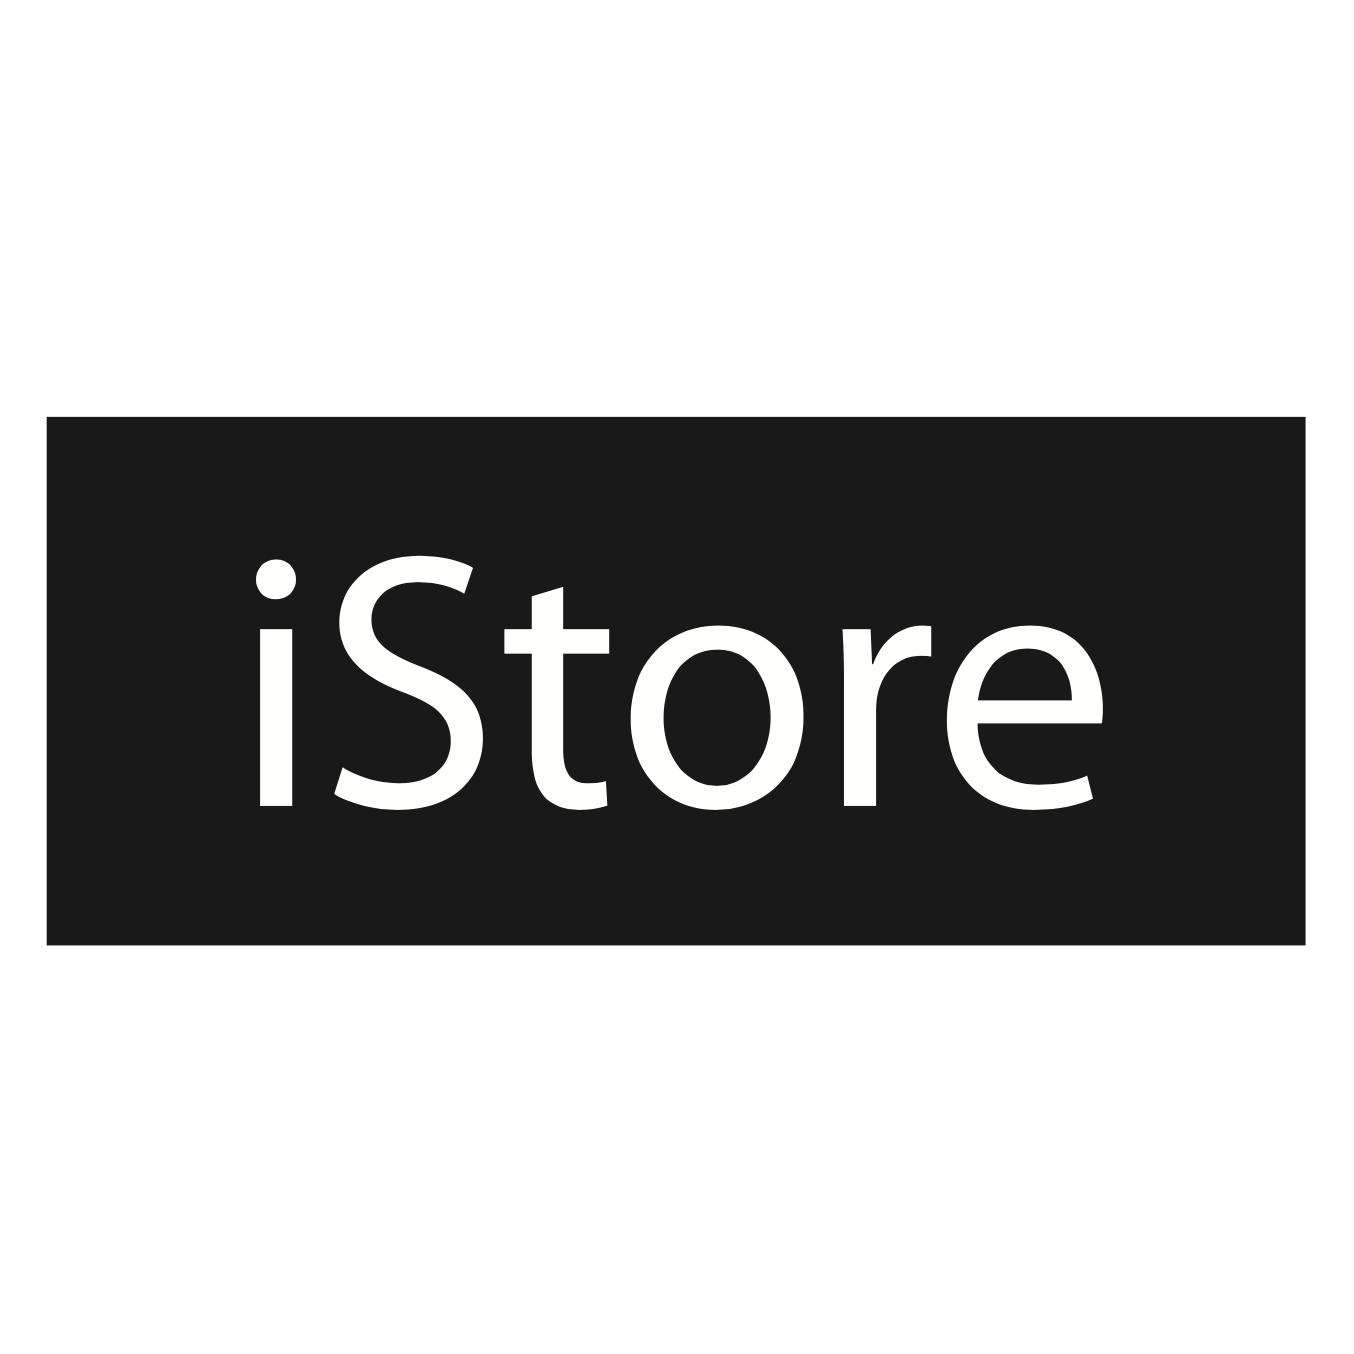 iPad mini 4 Silicone Case - White